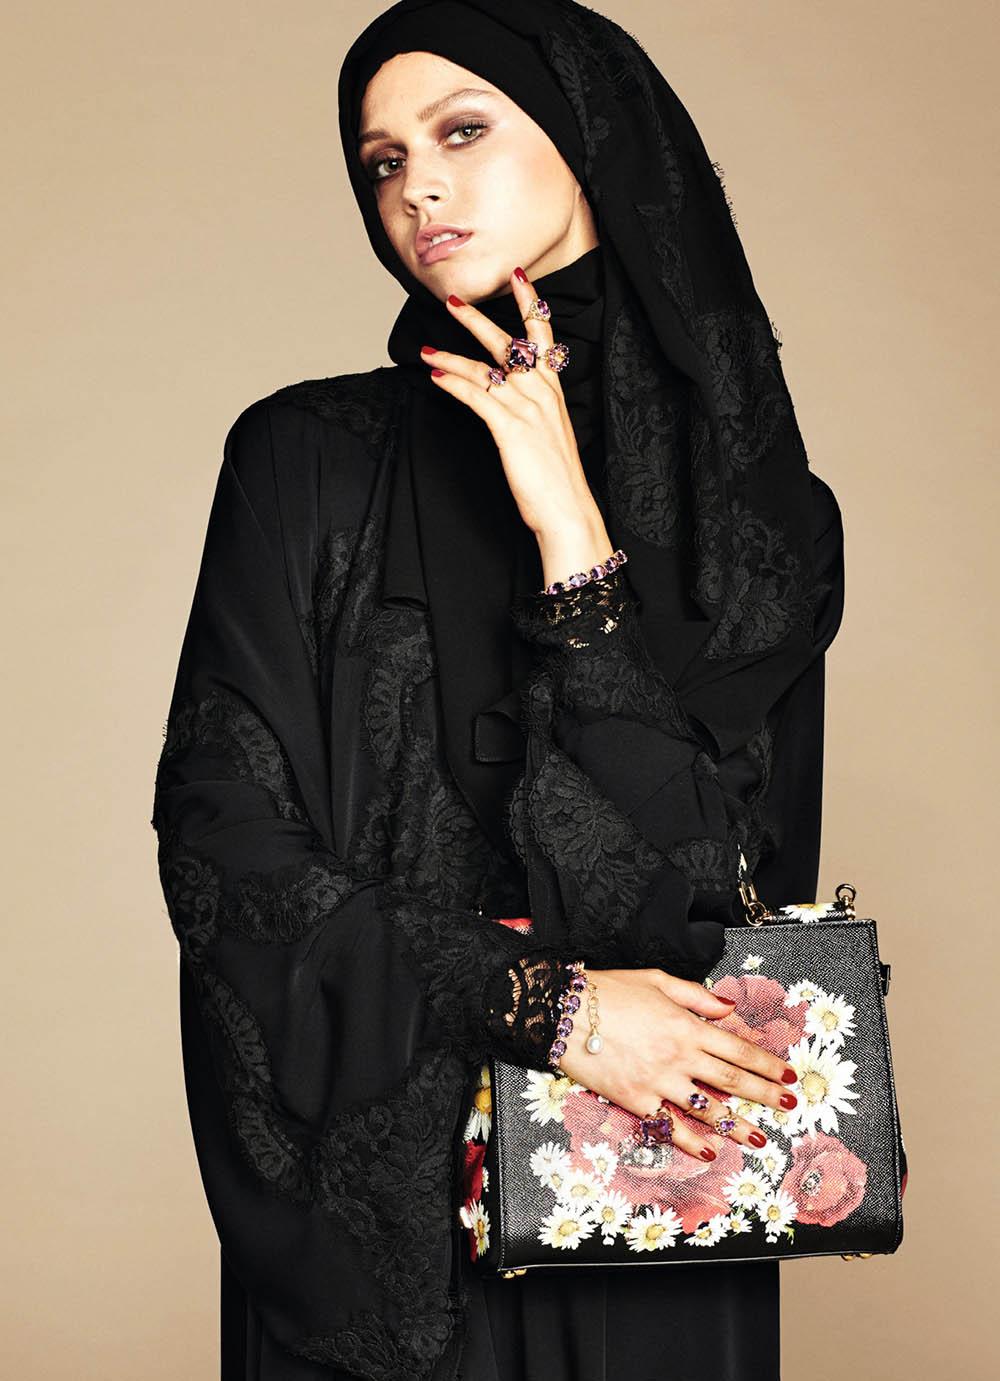 griot-mag-2-dolce-gabbana-hijab-abaja-velo-islam-3